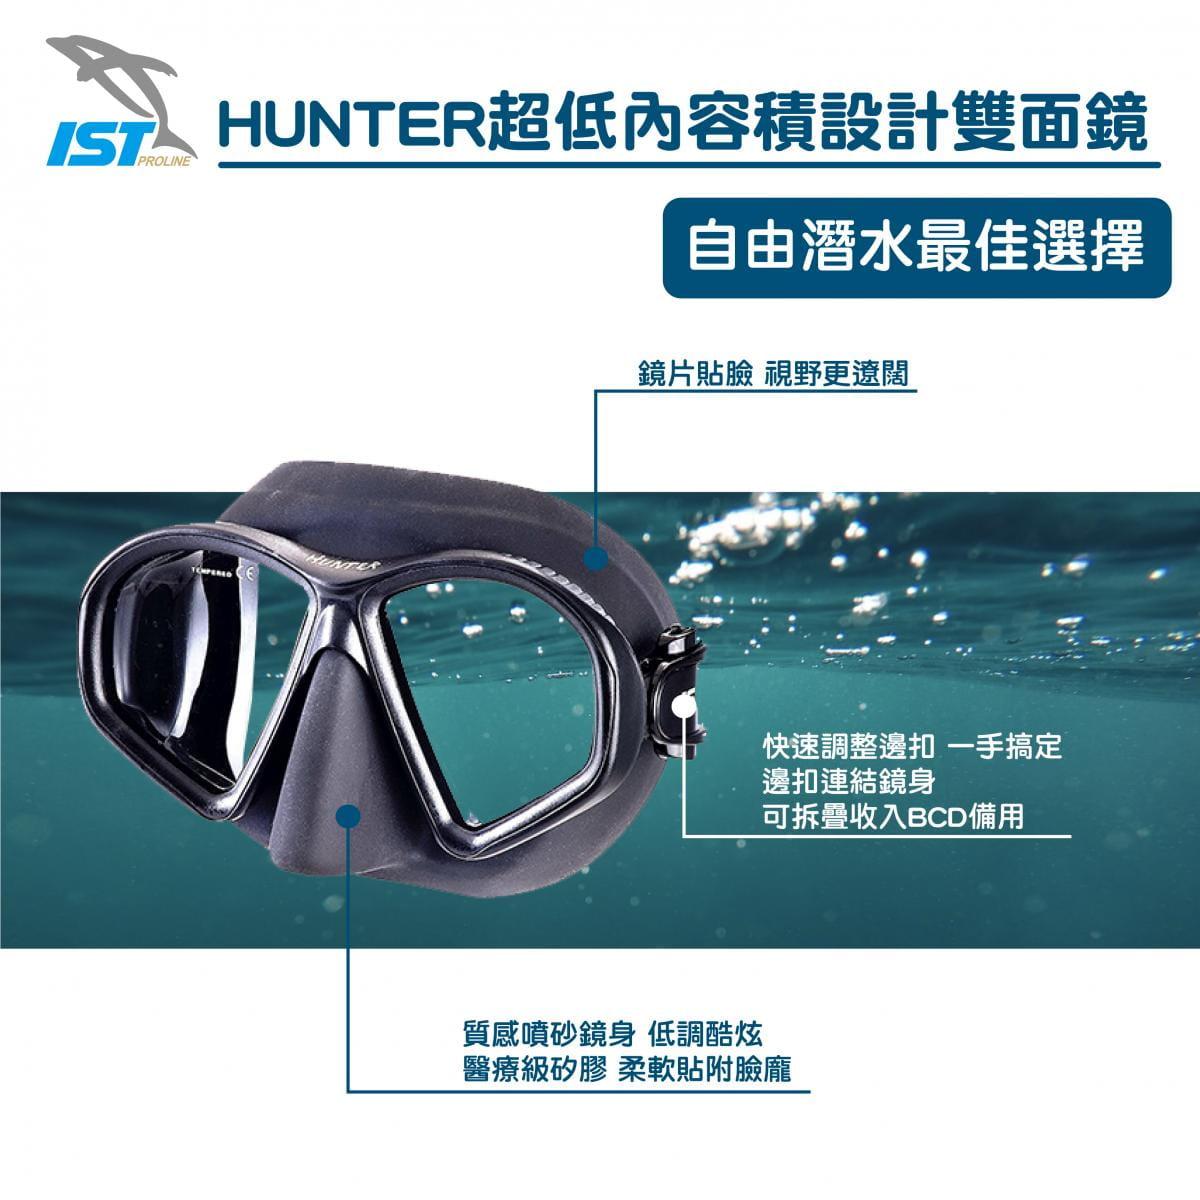 【IST】CS36 - HUNTER自由潛水新手套組 - 加贈環保網袋 3